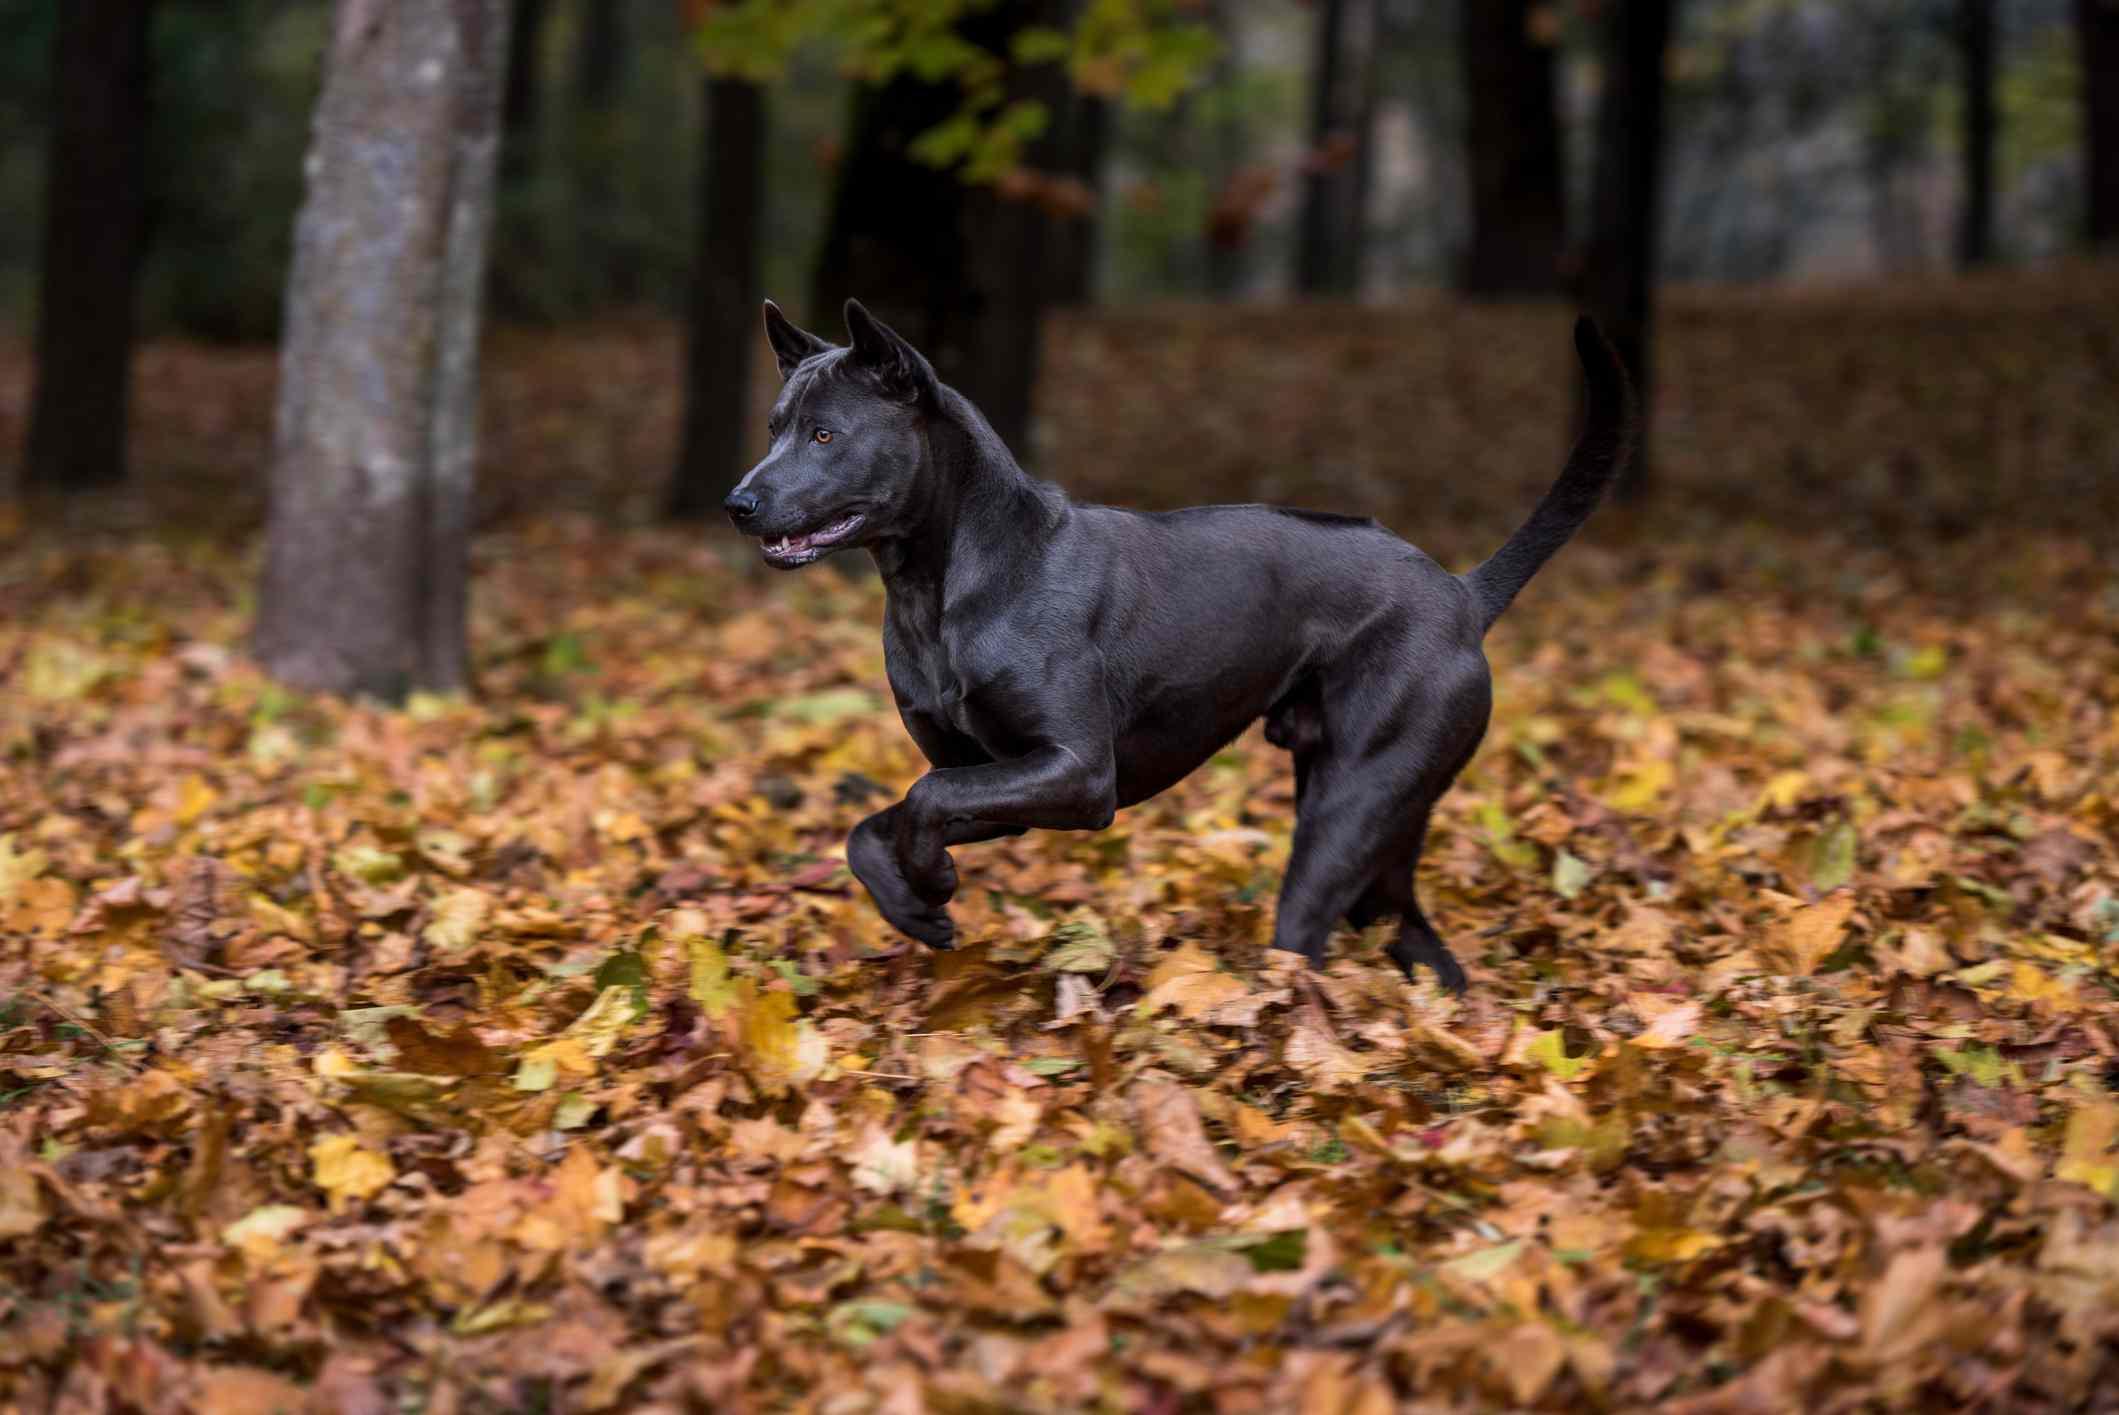 sleek black thai ridgeback running through fallen autumn leaves